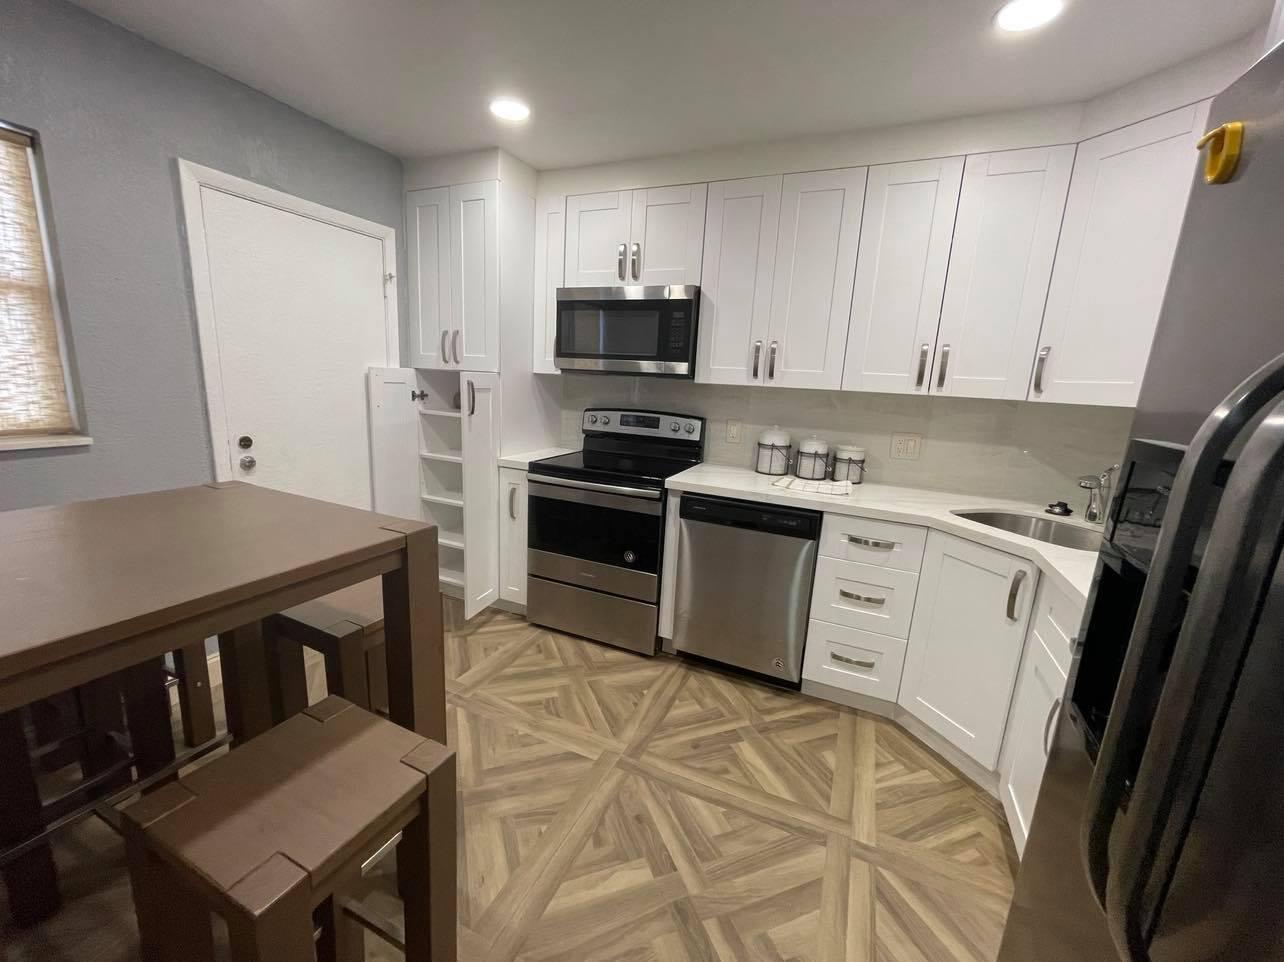 6100 Falls Cir Drive, Lauderhill, Florida 33319, 2 Bedrooms Bedrooms, ,2 BathroomsBathrooms,Residential,For Sale,Falls Cir,RX-10713564